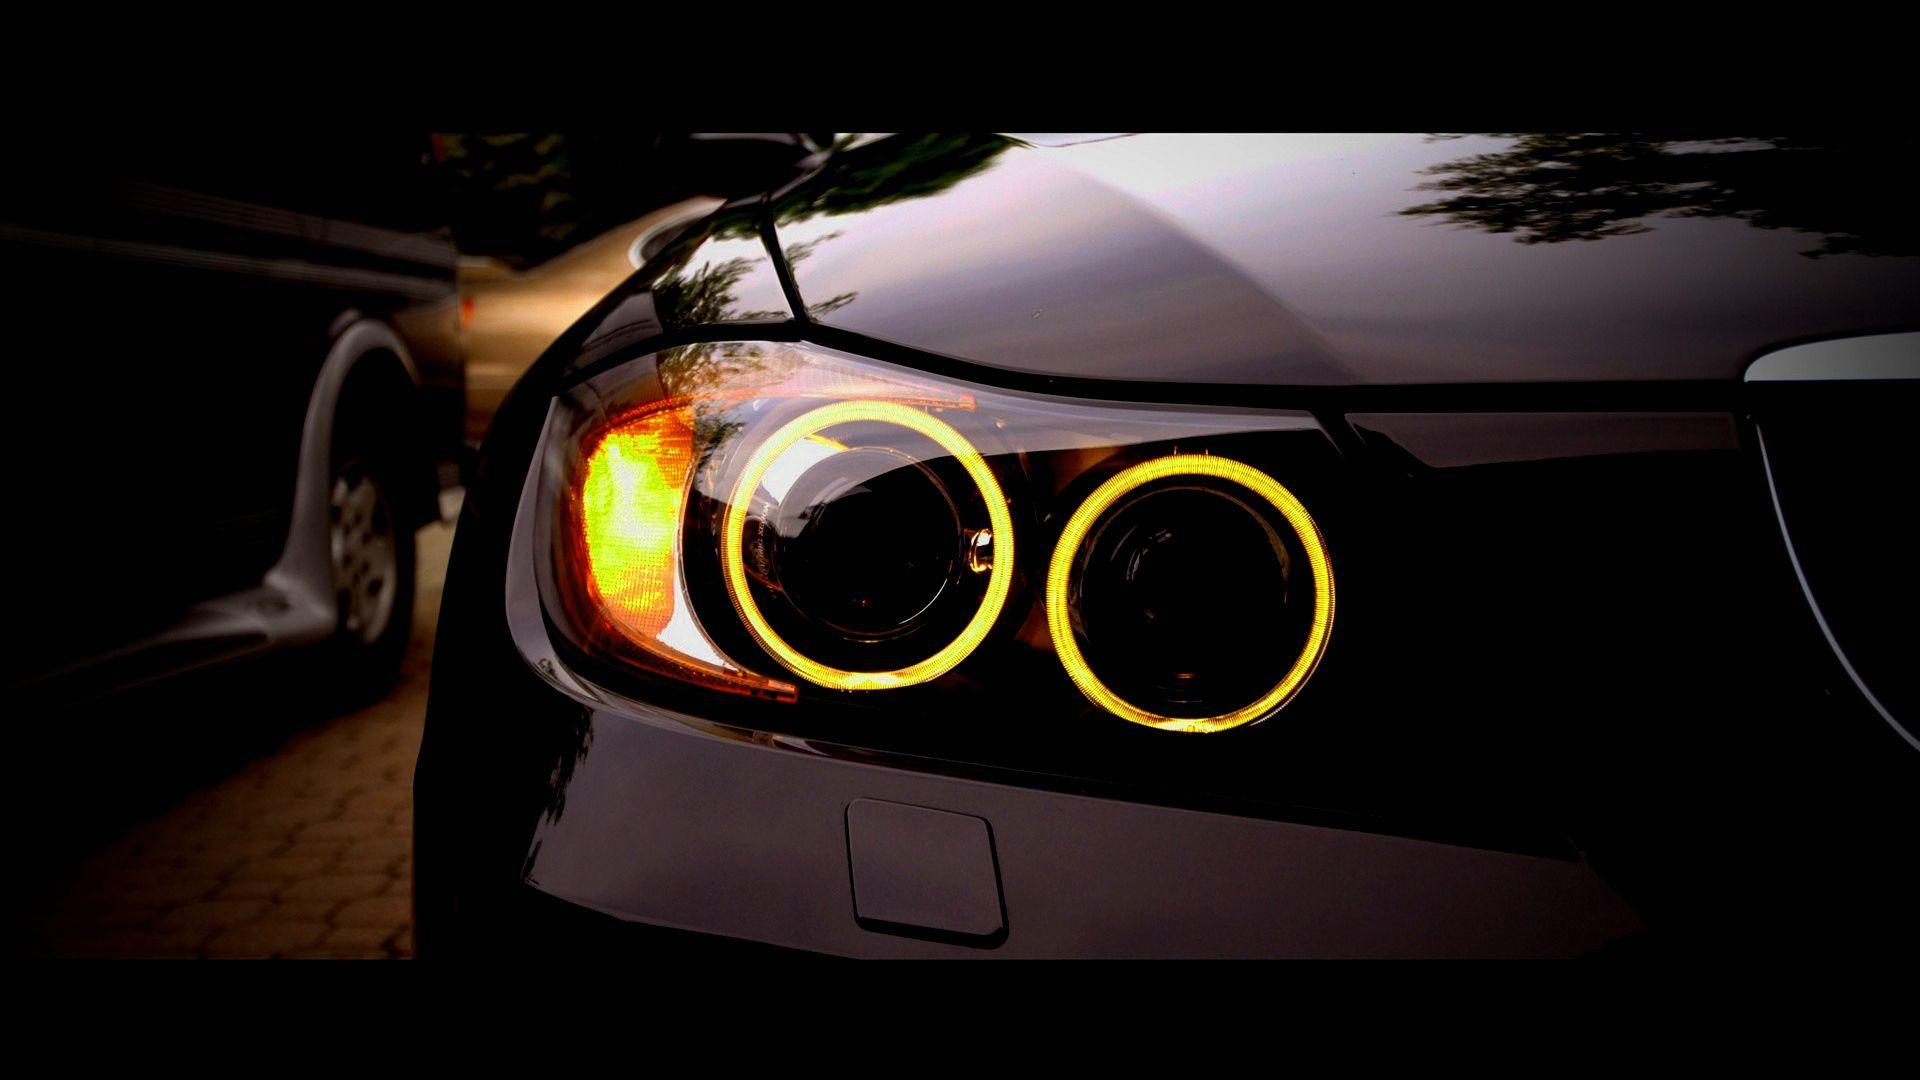 Full Hd Bmw Car Hd Wallpapers 1080p